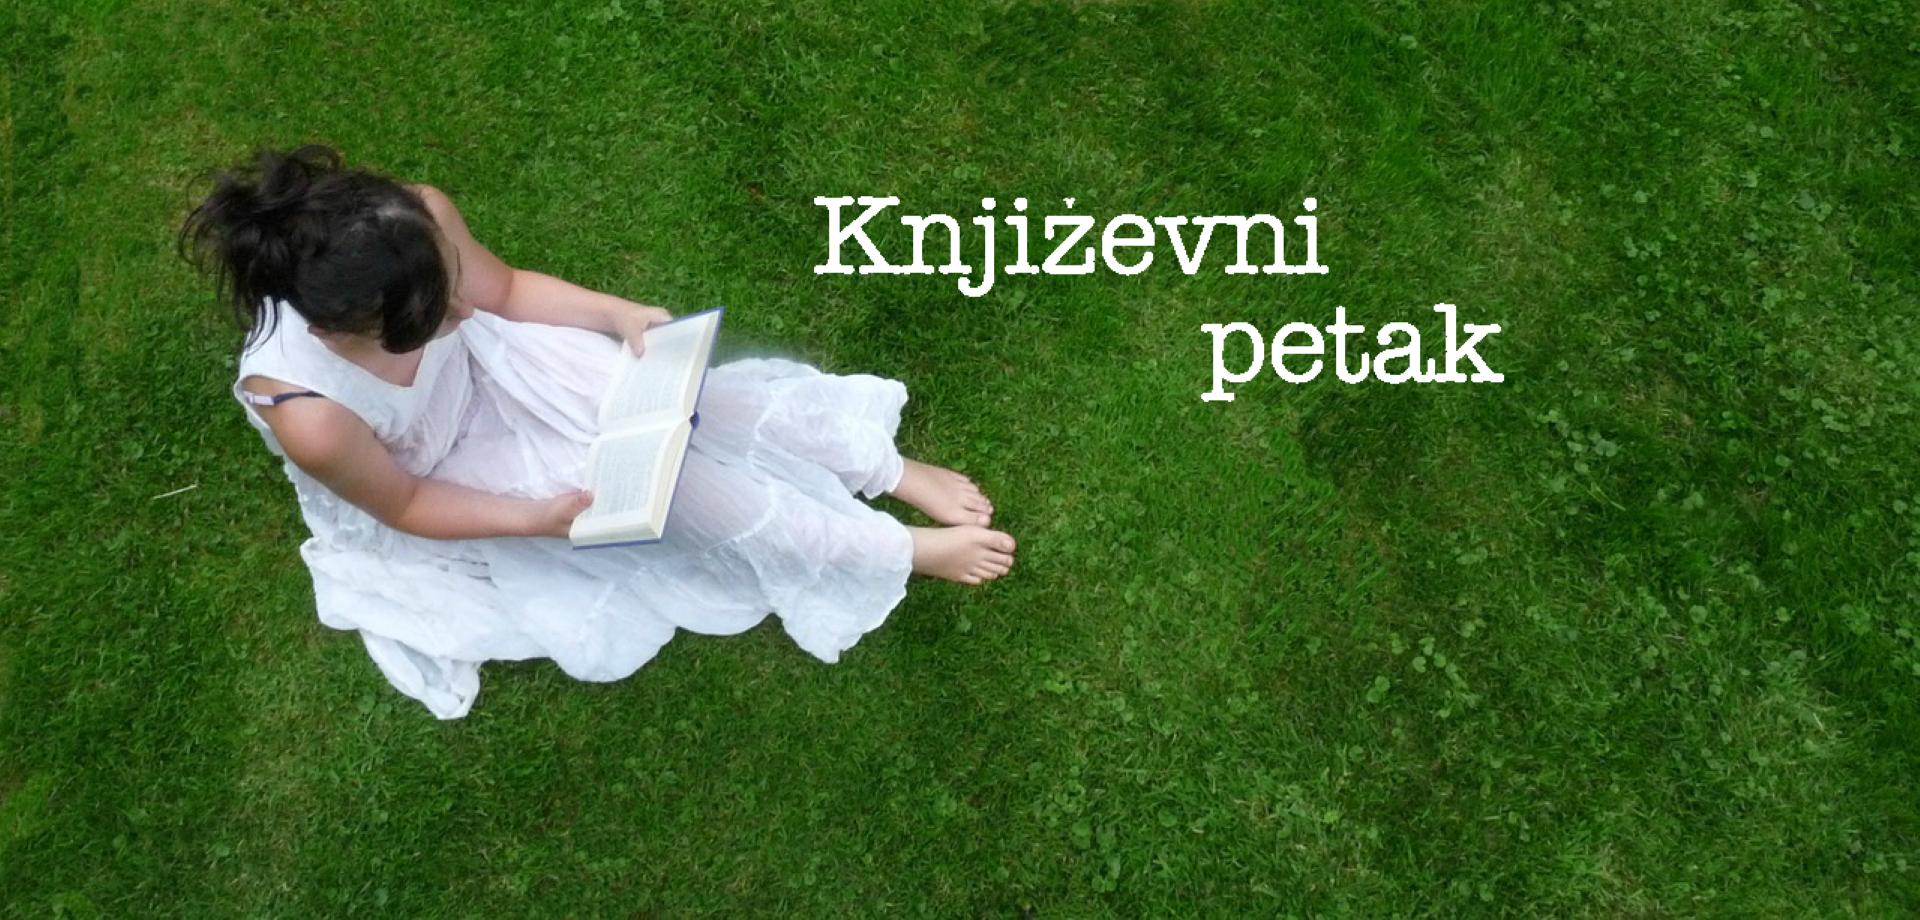 Photo of Književni petak: Recenzija knjige – Dalaj lamina mačka